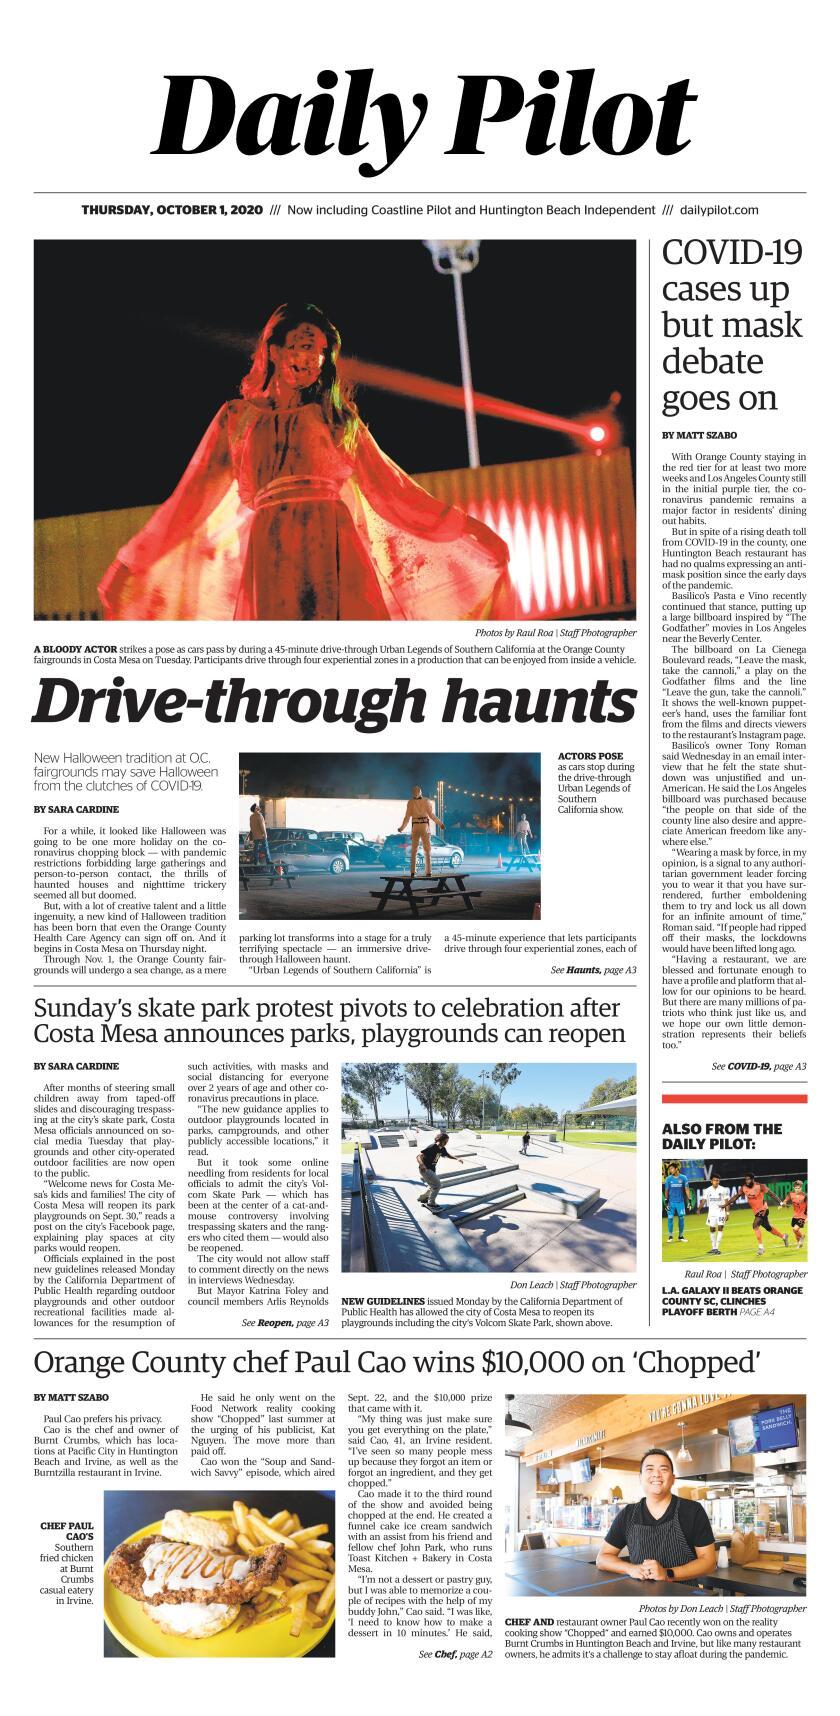 Thursday's Daily Pilot cover.